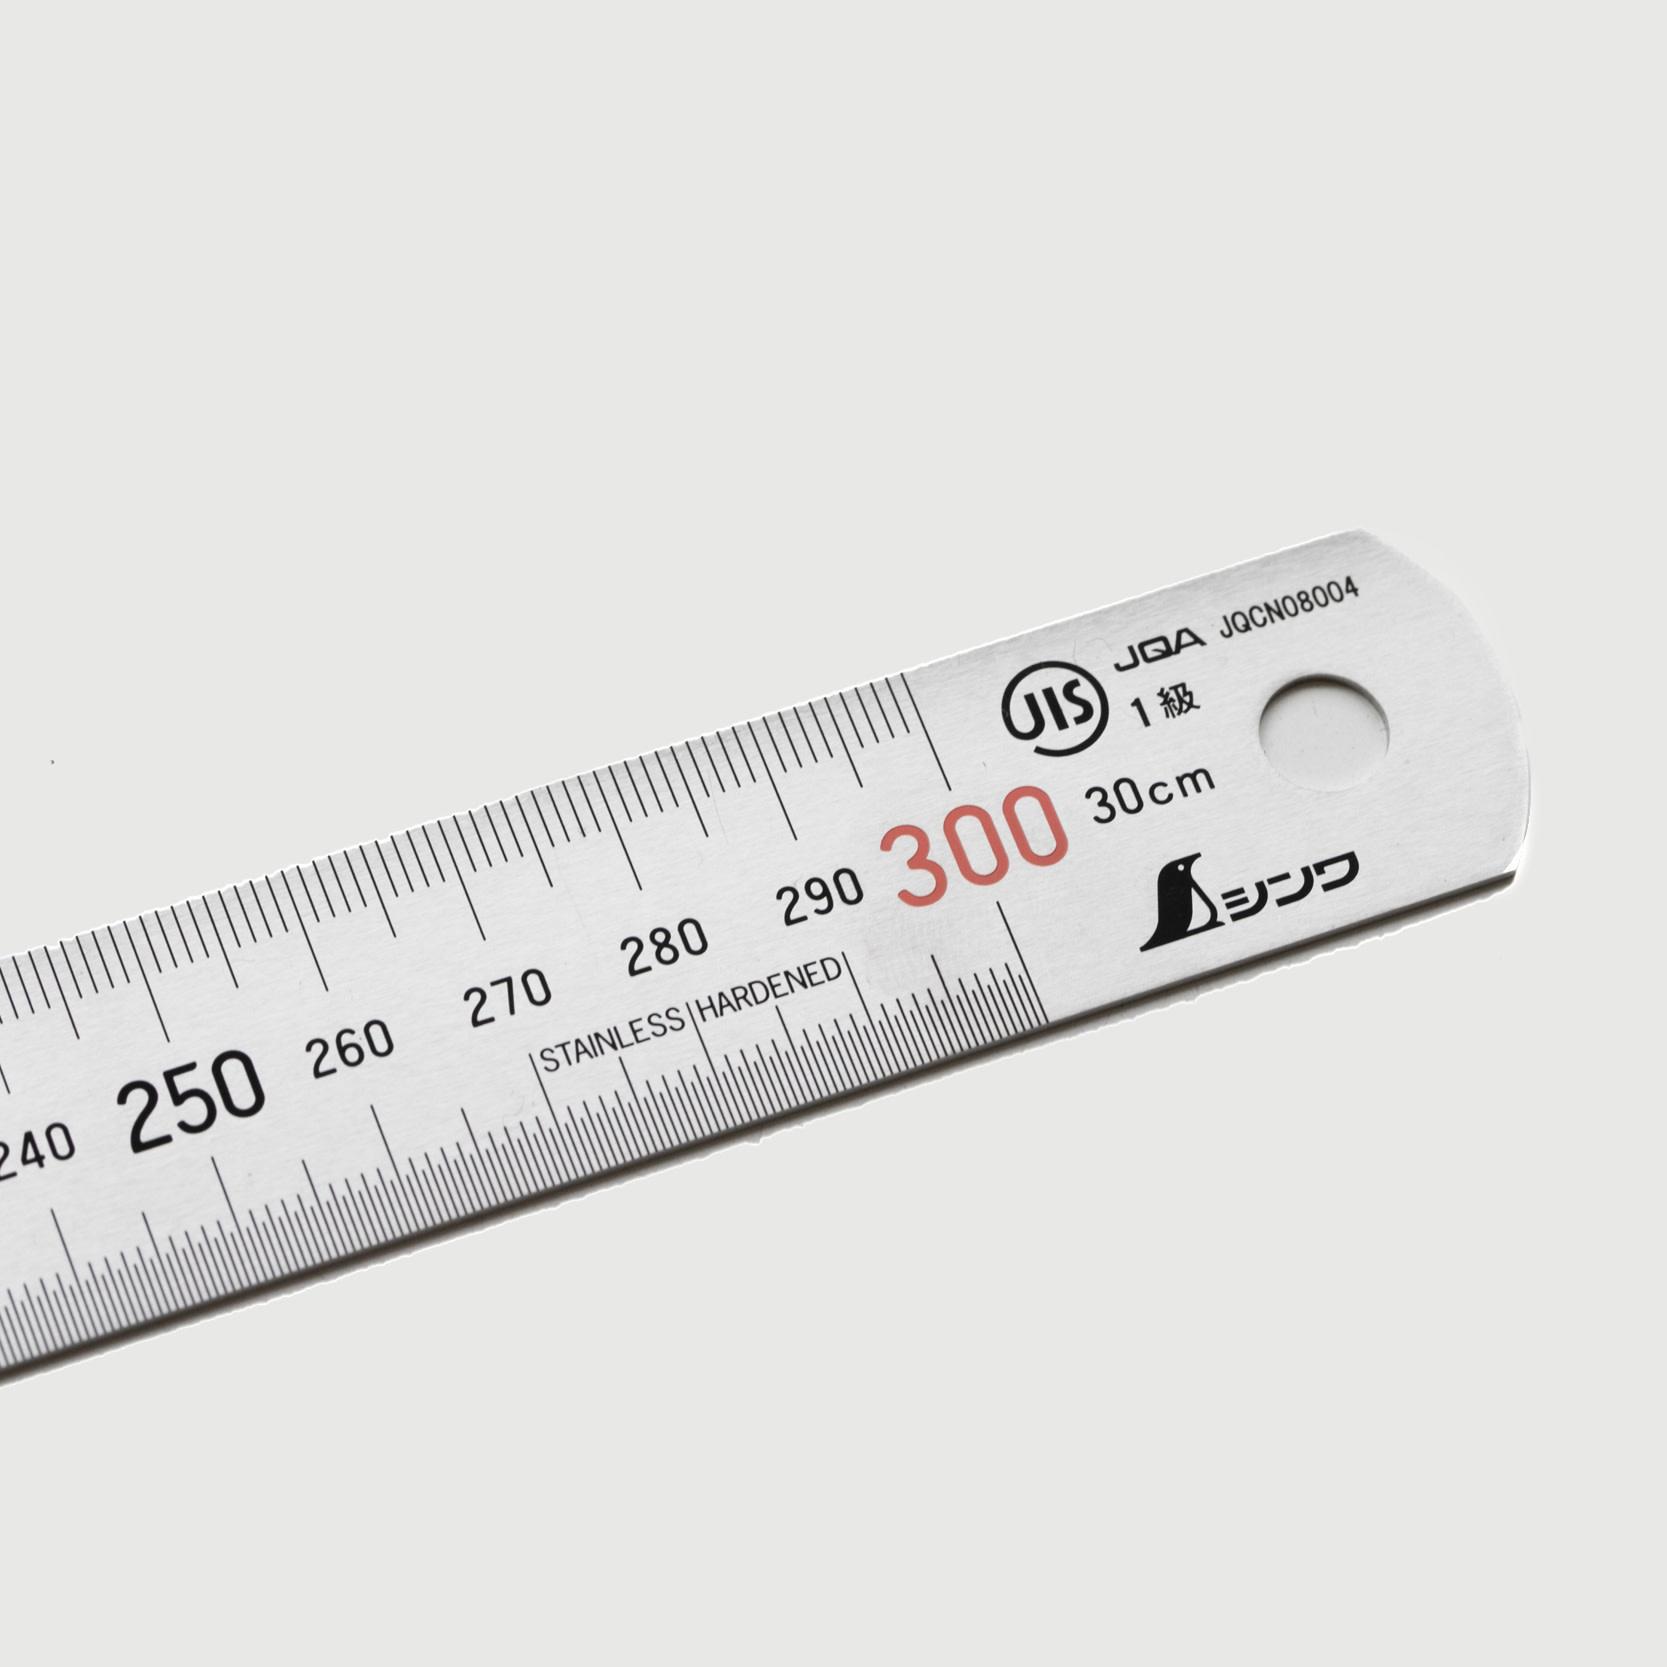 Shinwa Shinwa 300mm Japanese stainless Steel Ruler